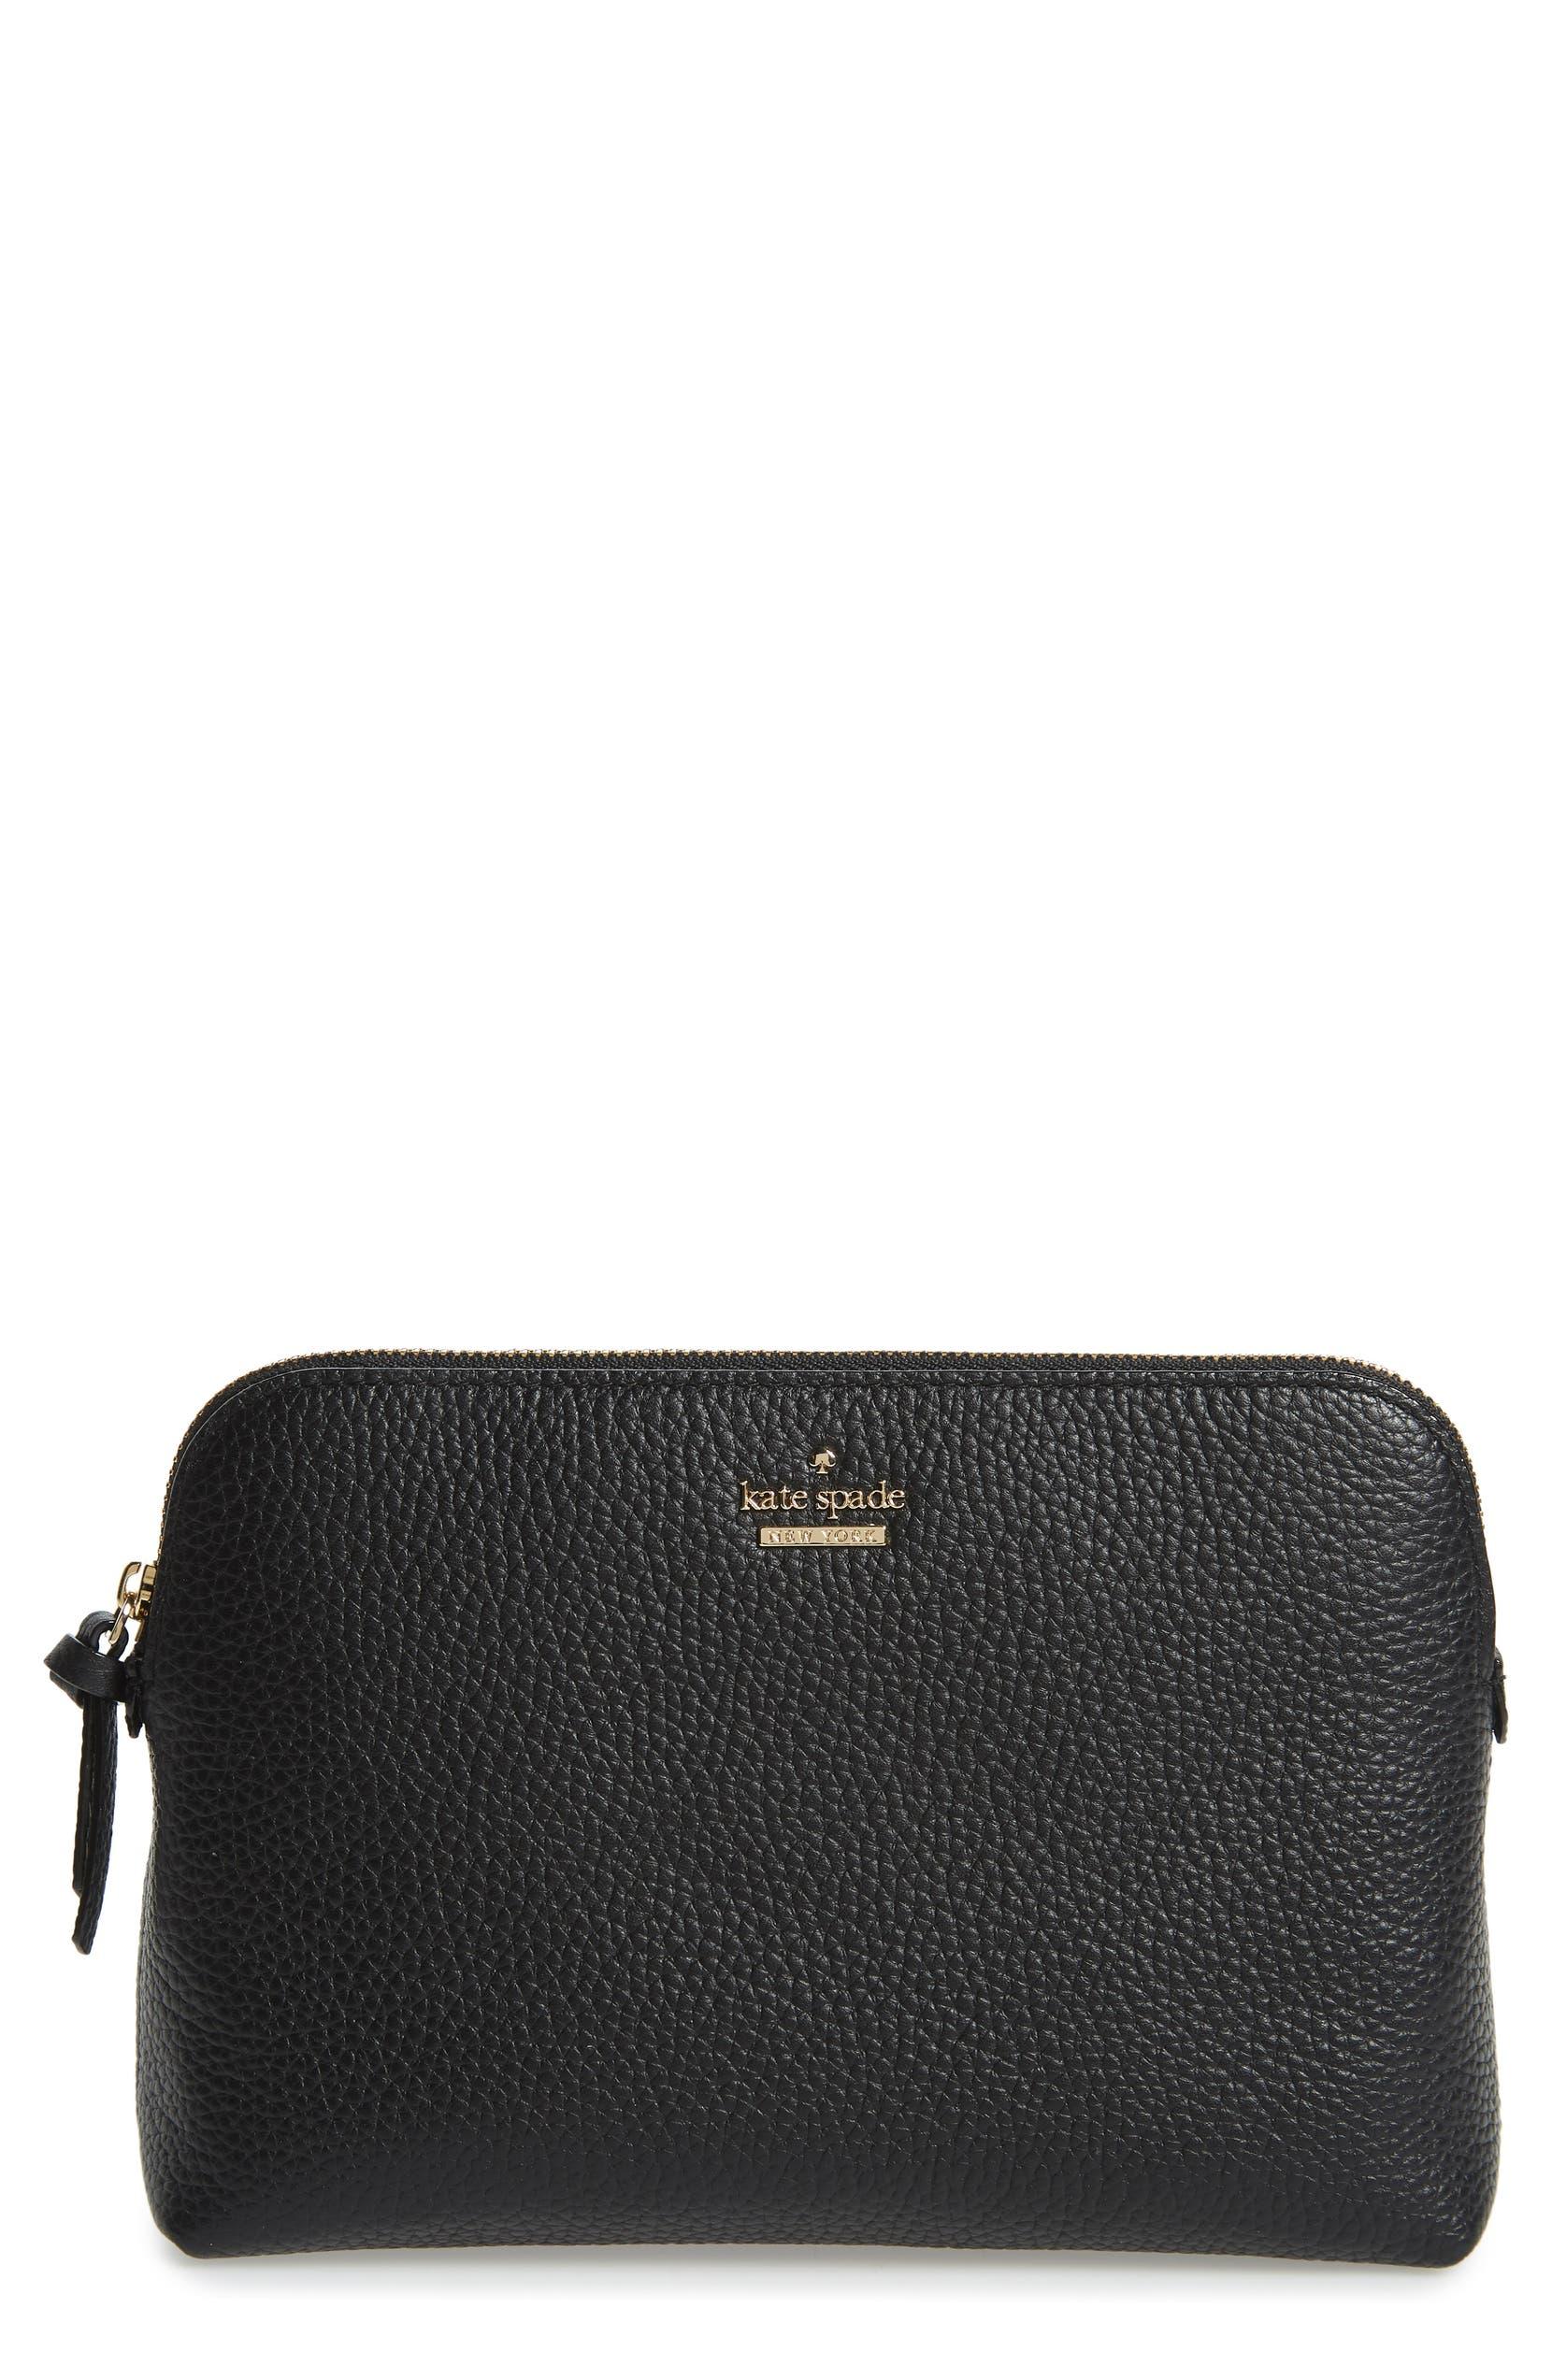 10a8088b7658 jackson street - small briley leather cosmetics bag